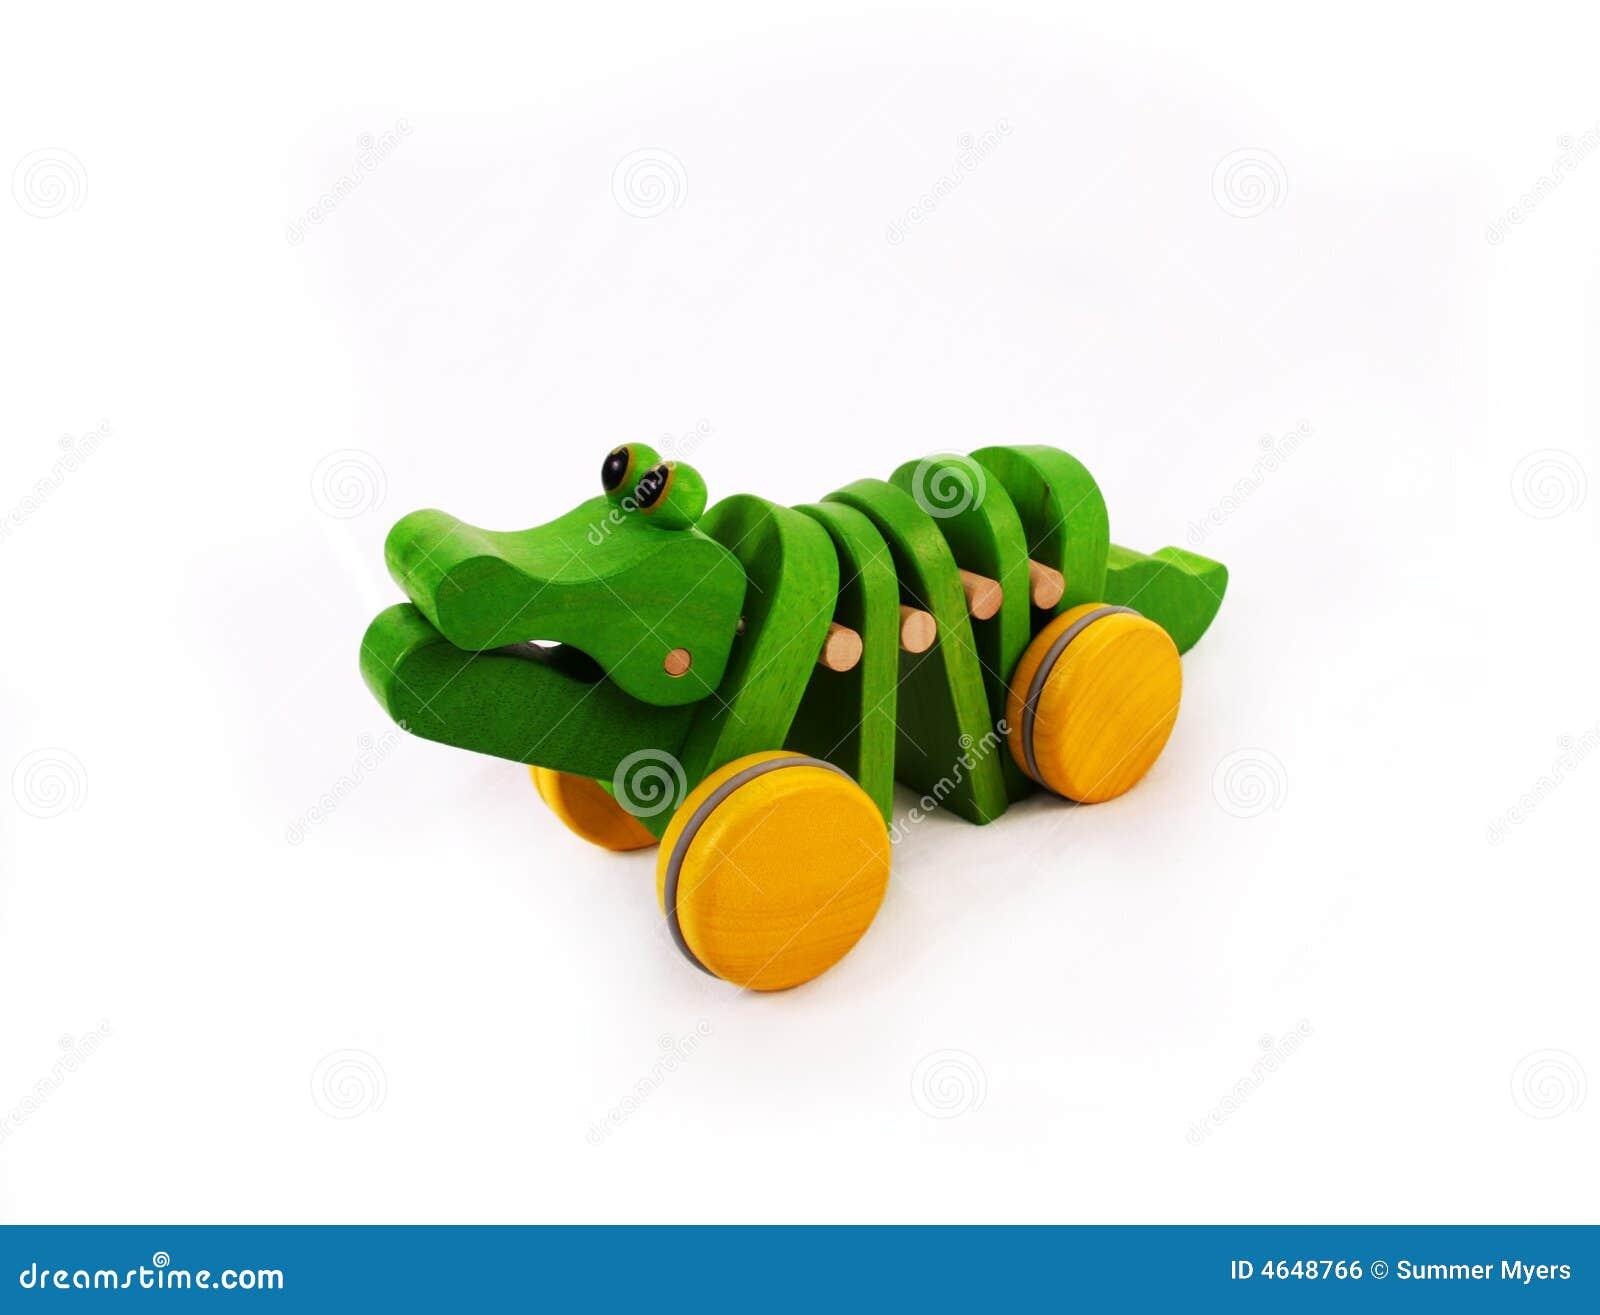 Brinquedo do crocodilo